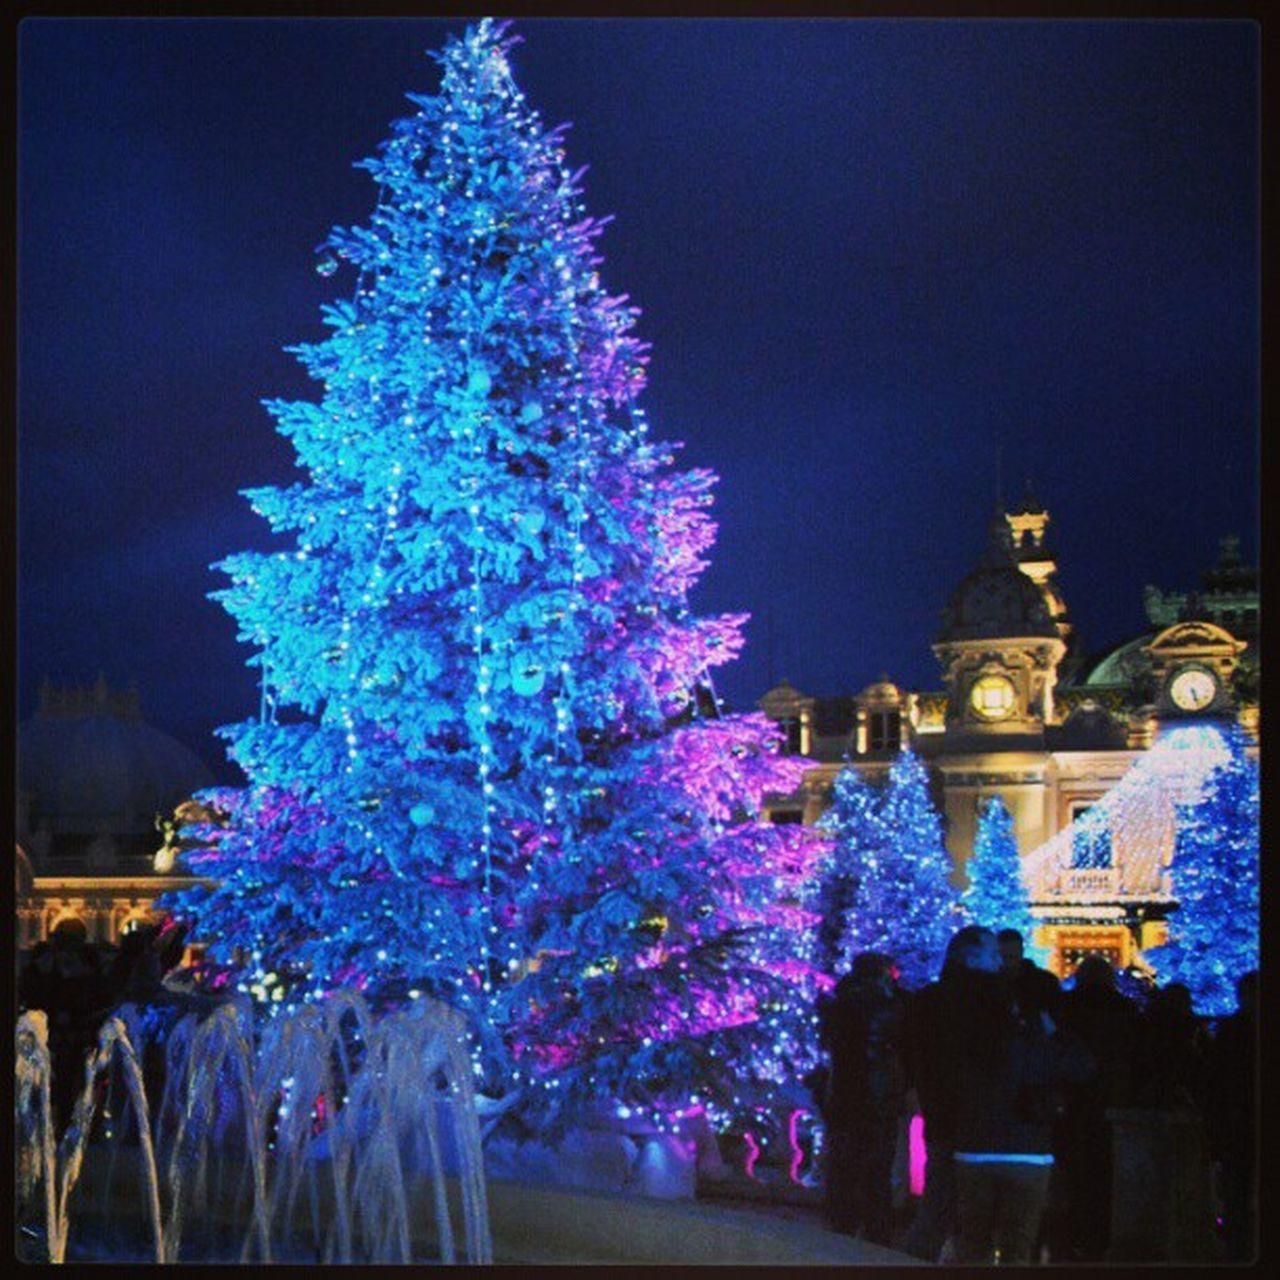 night, illuminated, celebration, christmas, christmas tree, building exterior, architecture, tree, christmas lights, no people, religion, outdoors, built structure, statue, christmas decoration, city, sky